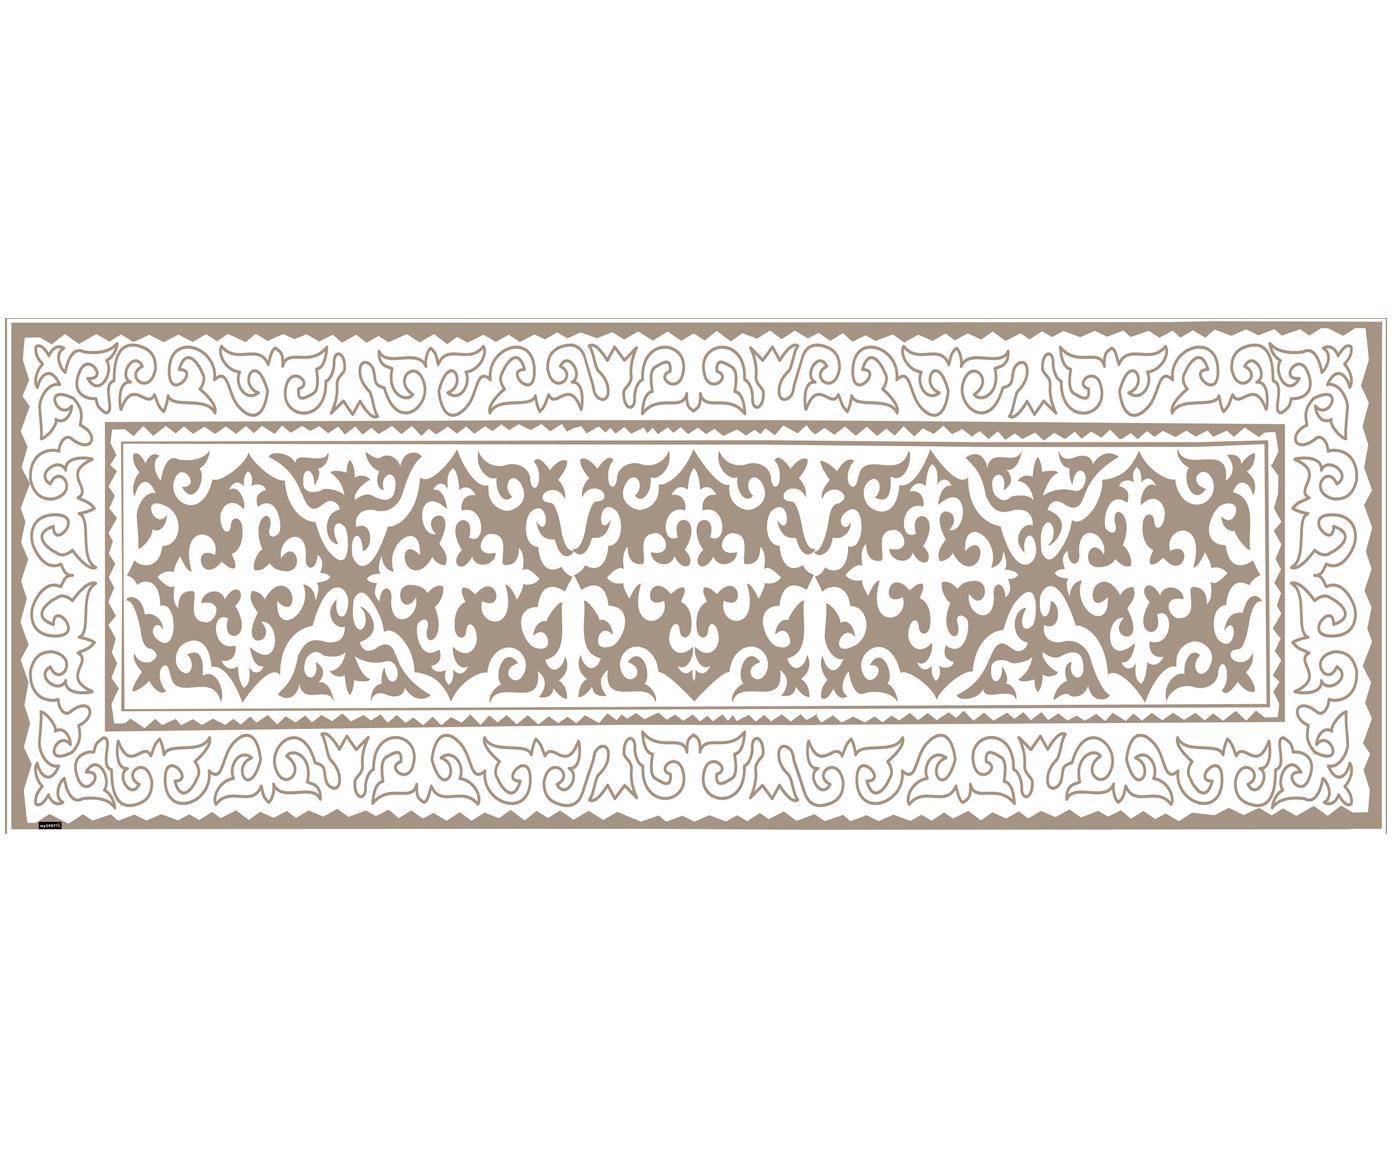 Alfombra vinílica Aksana, Vinilo, reciclable, Gris pardo, blanco, An 68 x L 180 cm